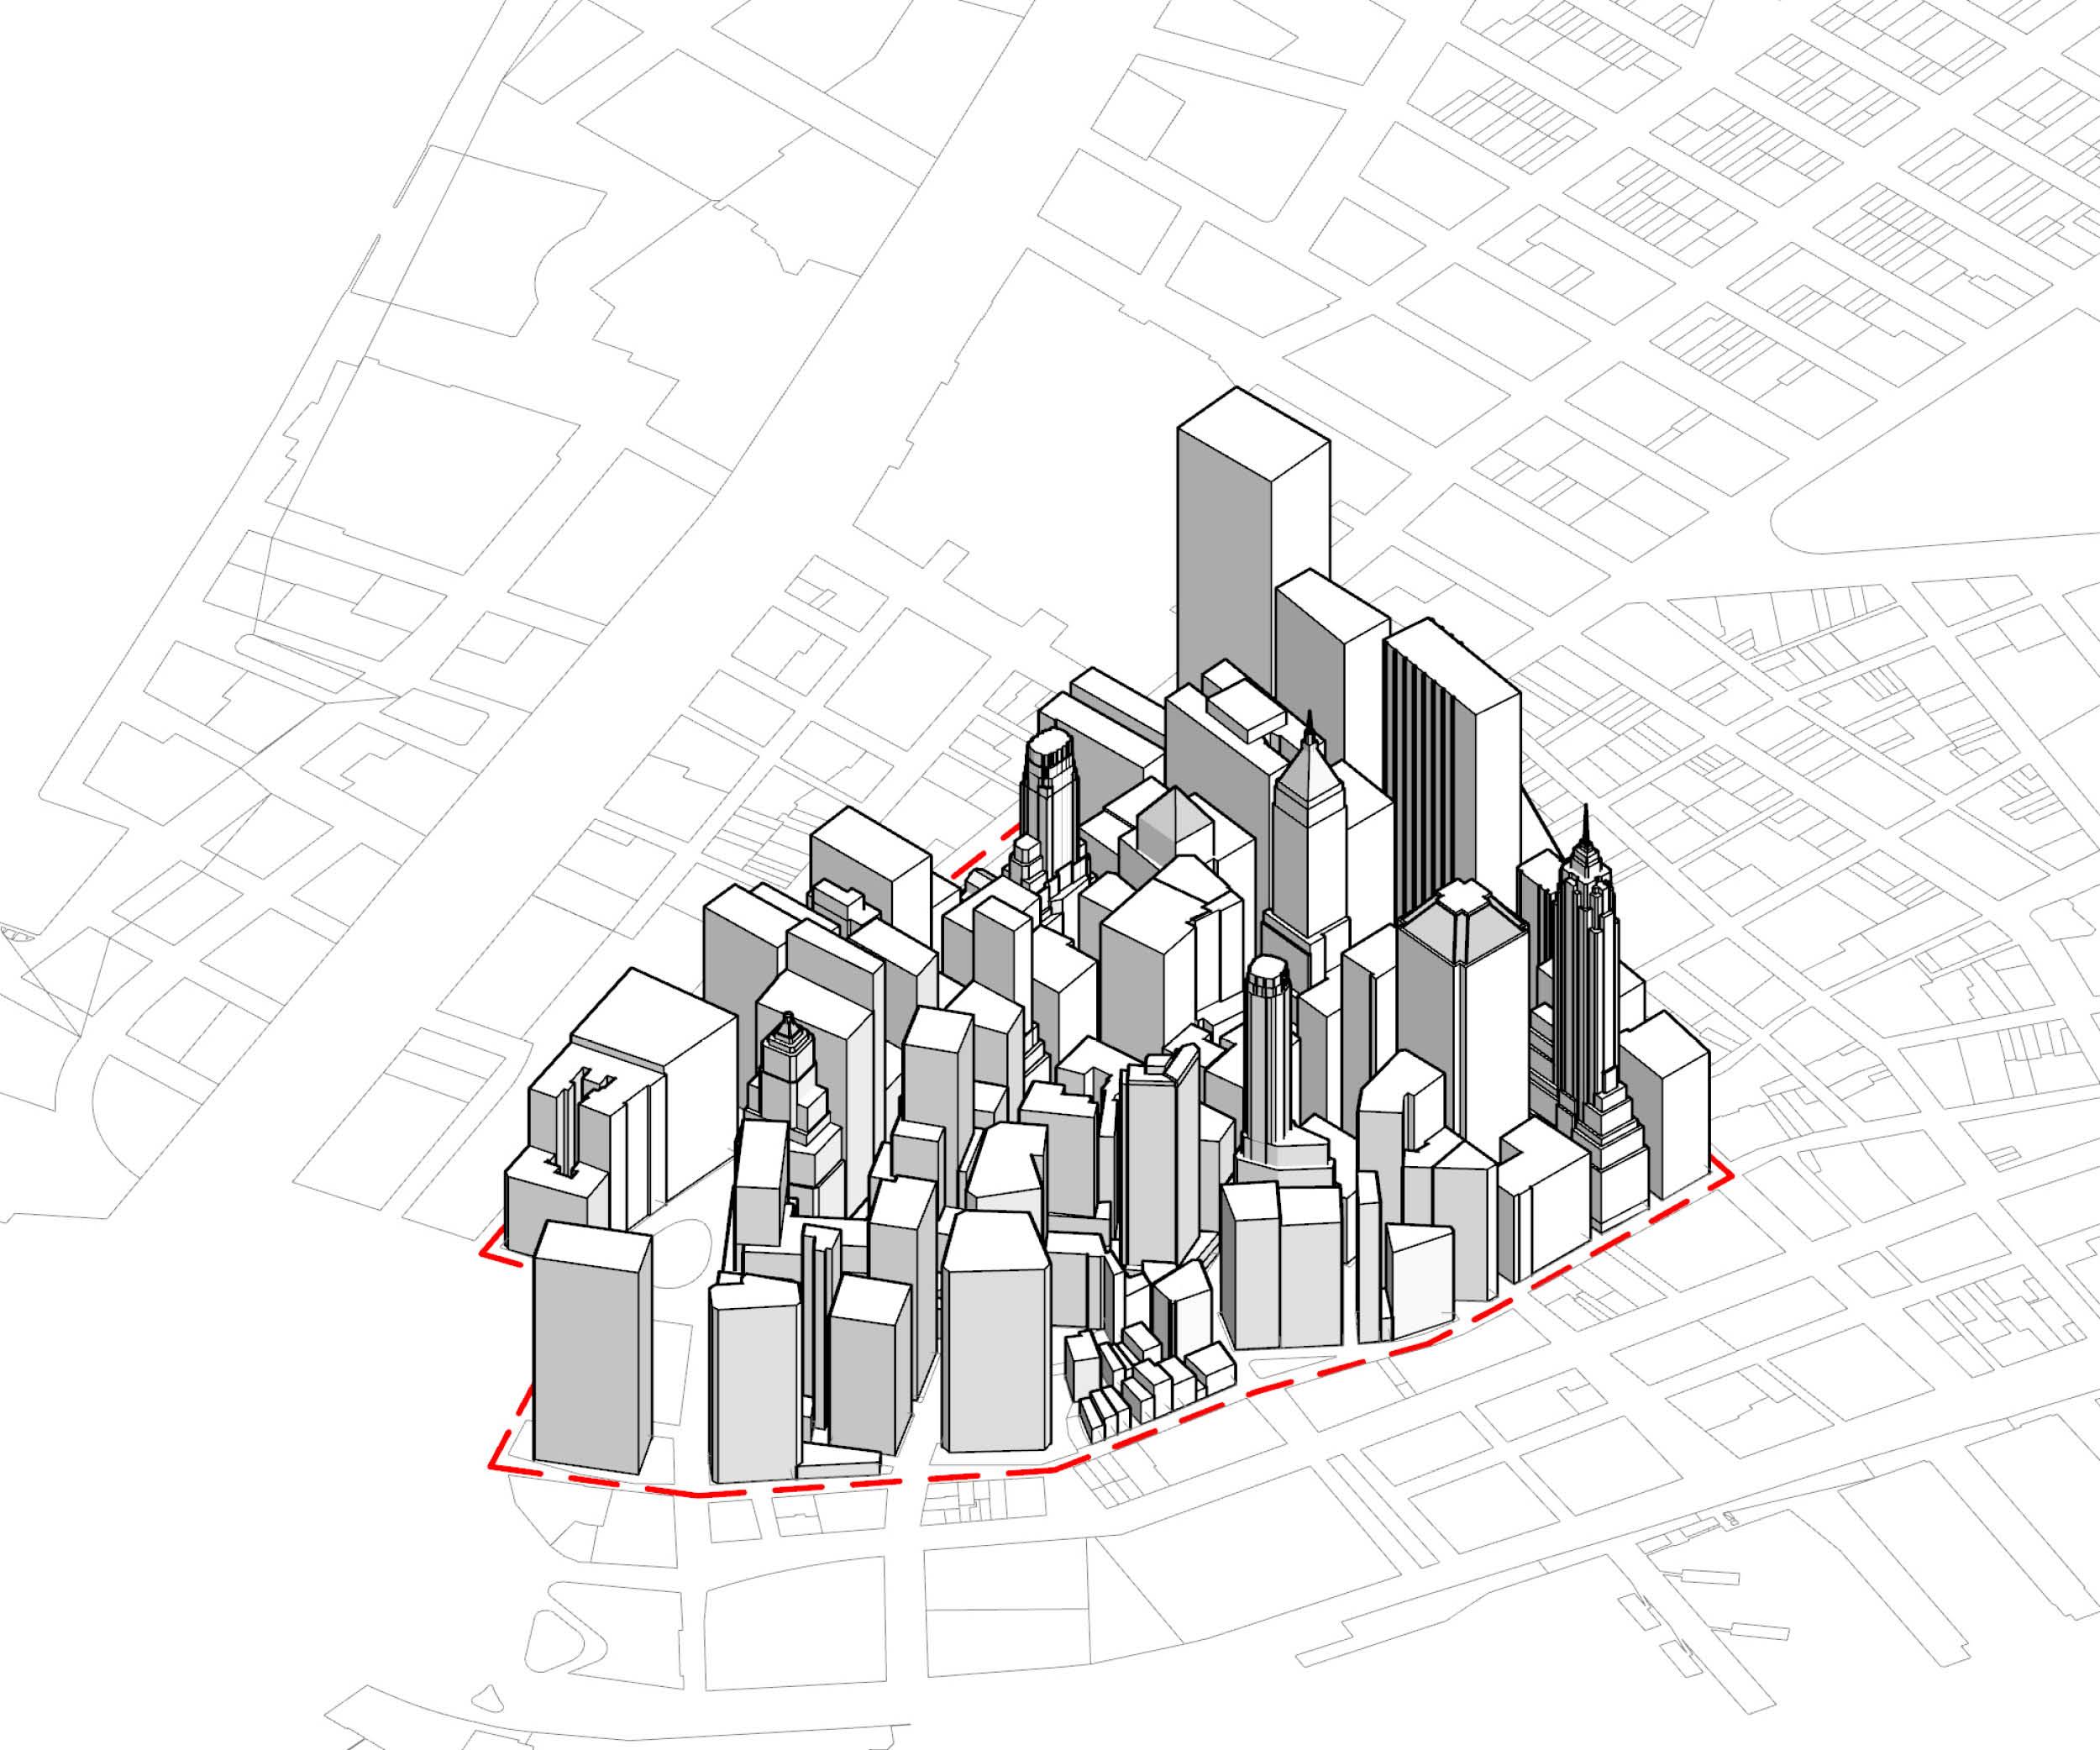 Financial District   LD FAR: 11.3  NYC FAR: 18.0